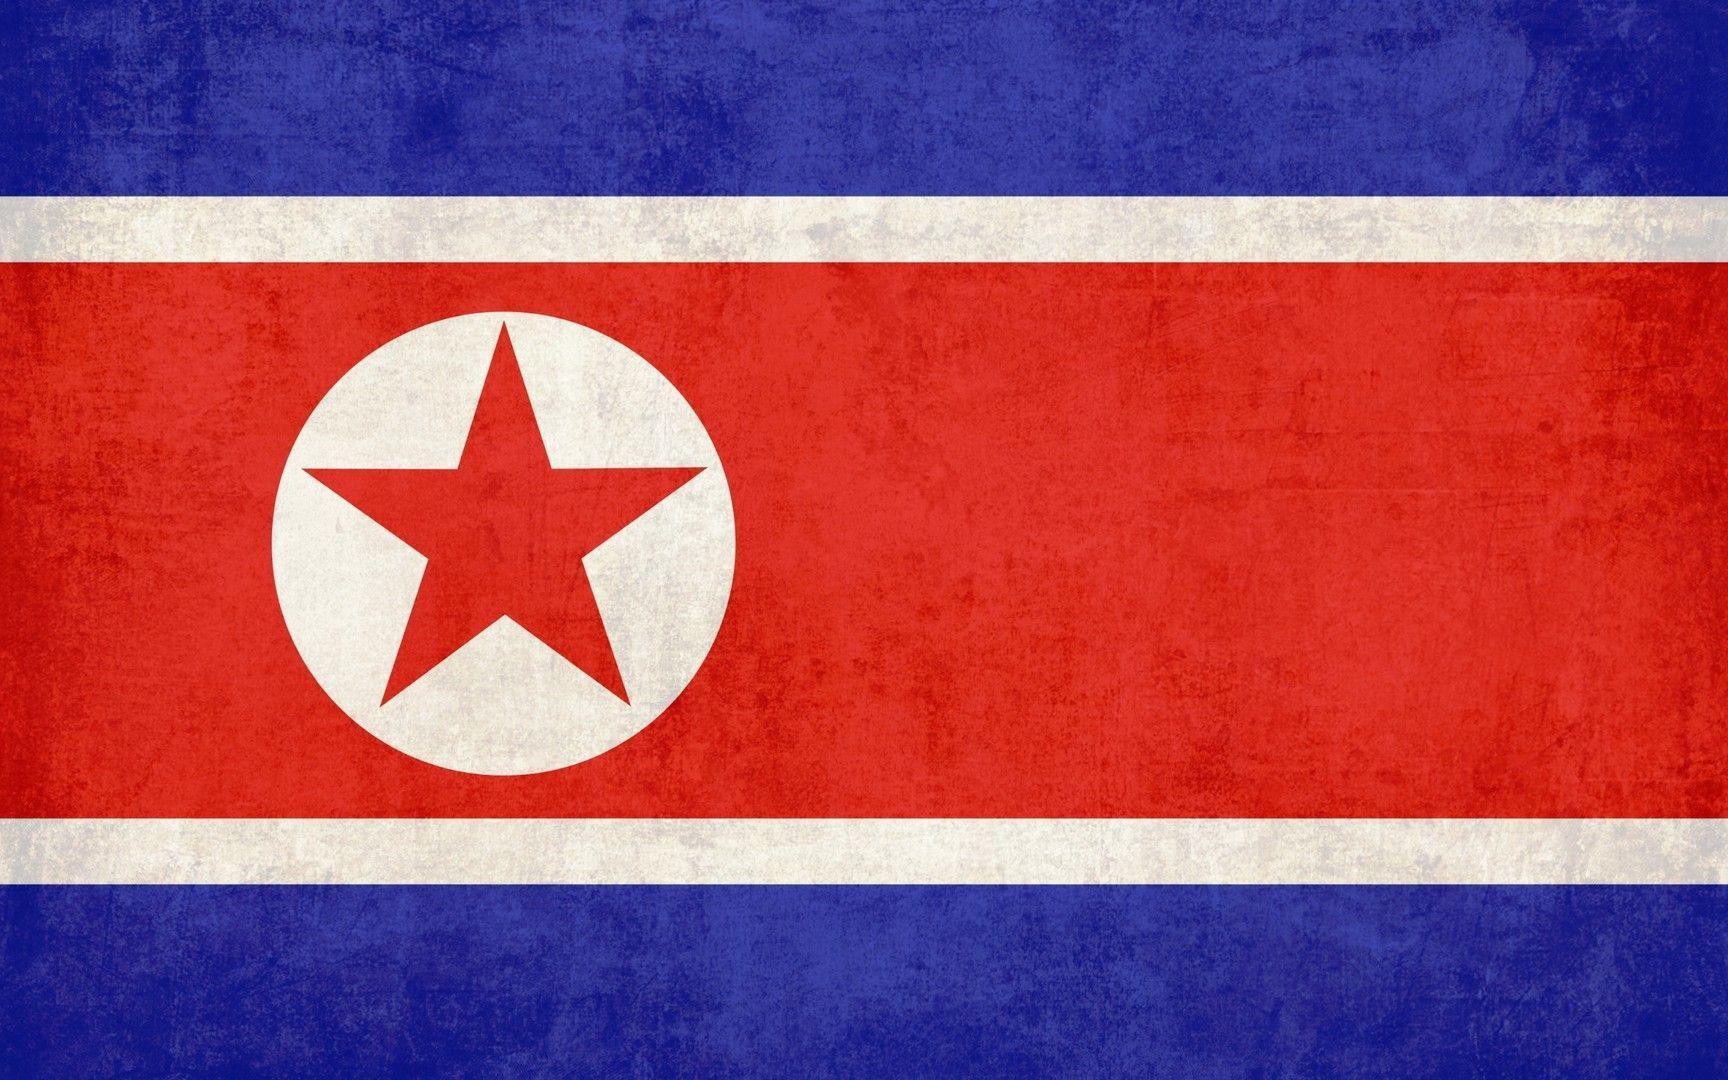 North Korea Flag Wallpapers Top Free North Korea Flag